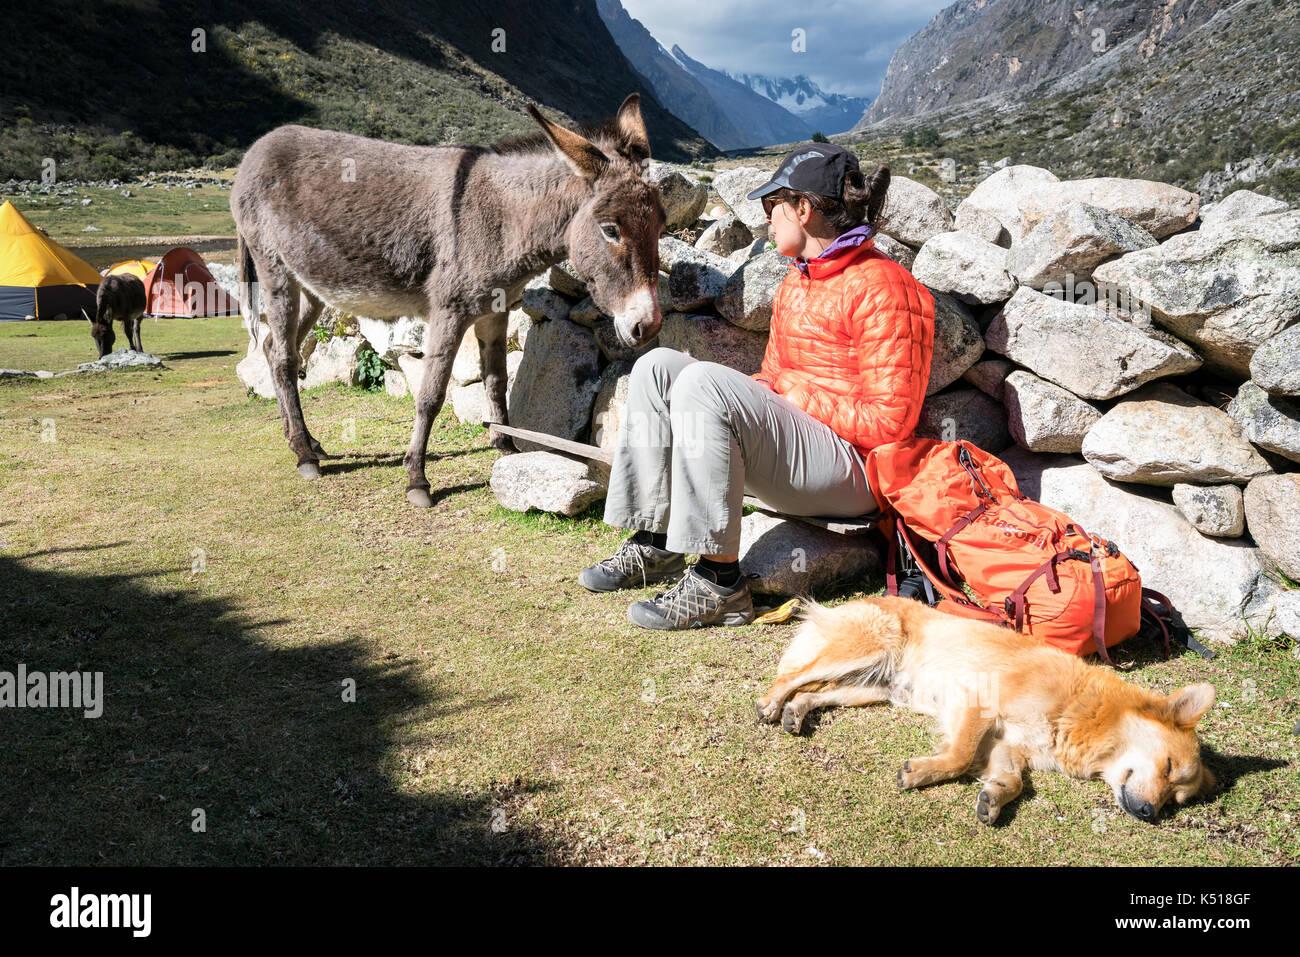 Having a break from trekking in Santa Cruz valley, Cordillera Blanca, Peru - Stock Image